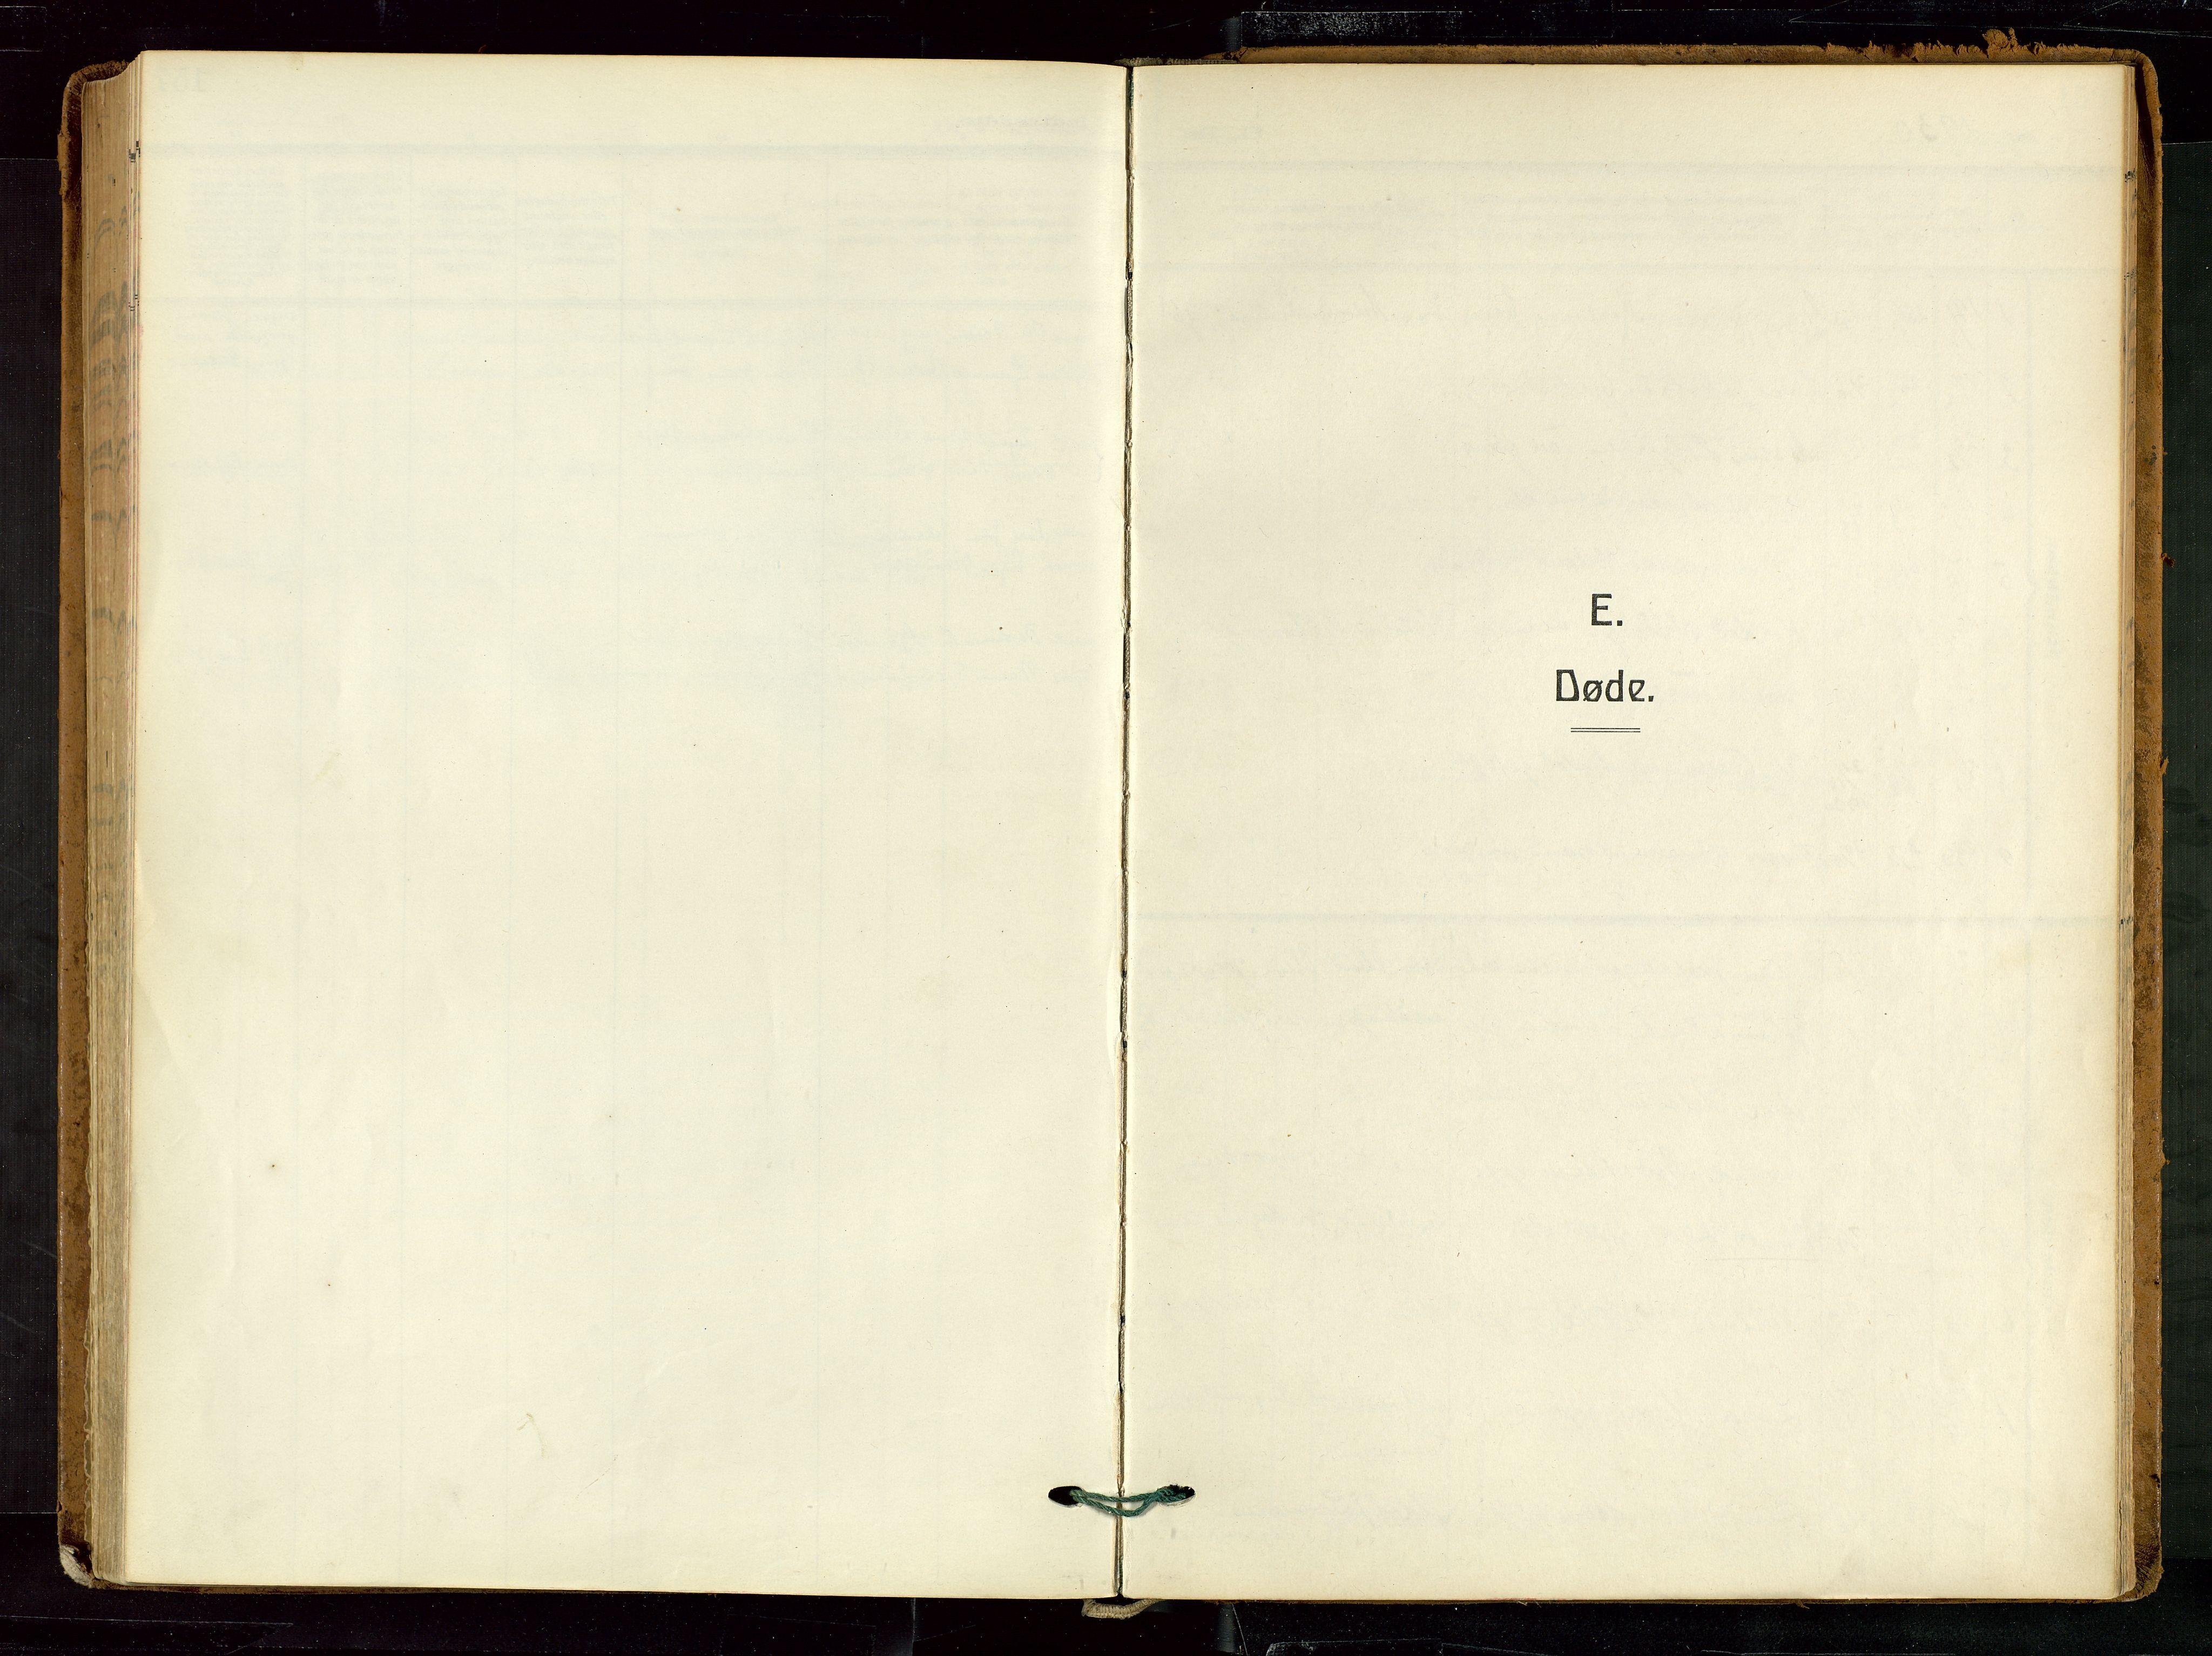 SAST, Strand sokneprestkontor, H/Ha/Haa/L0012: Ministerialbok nr. A 12, 1927-1946